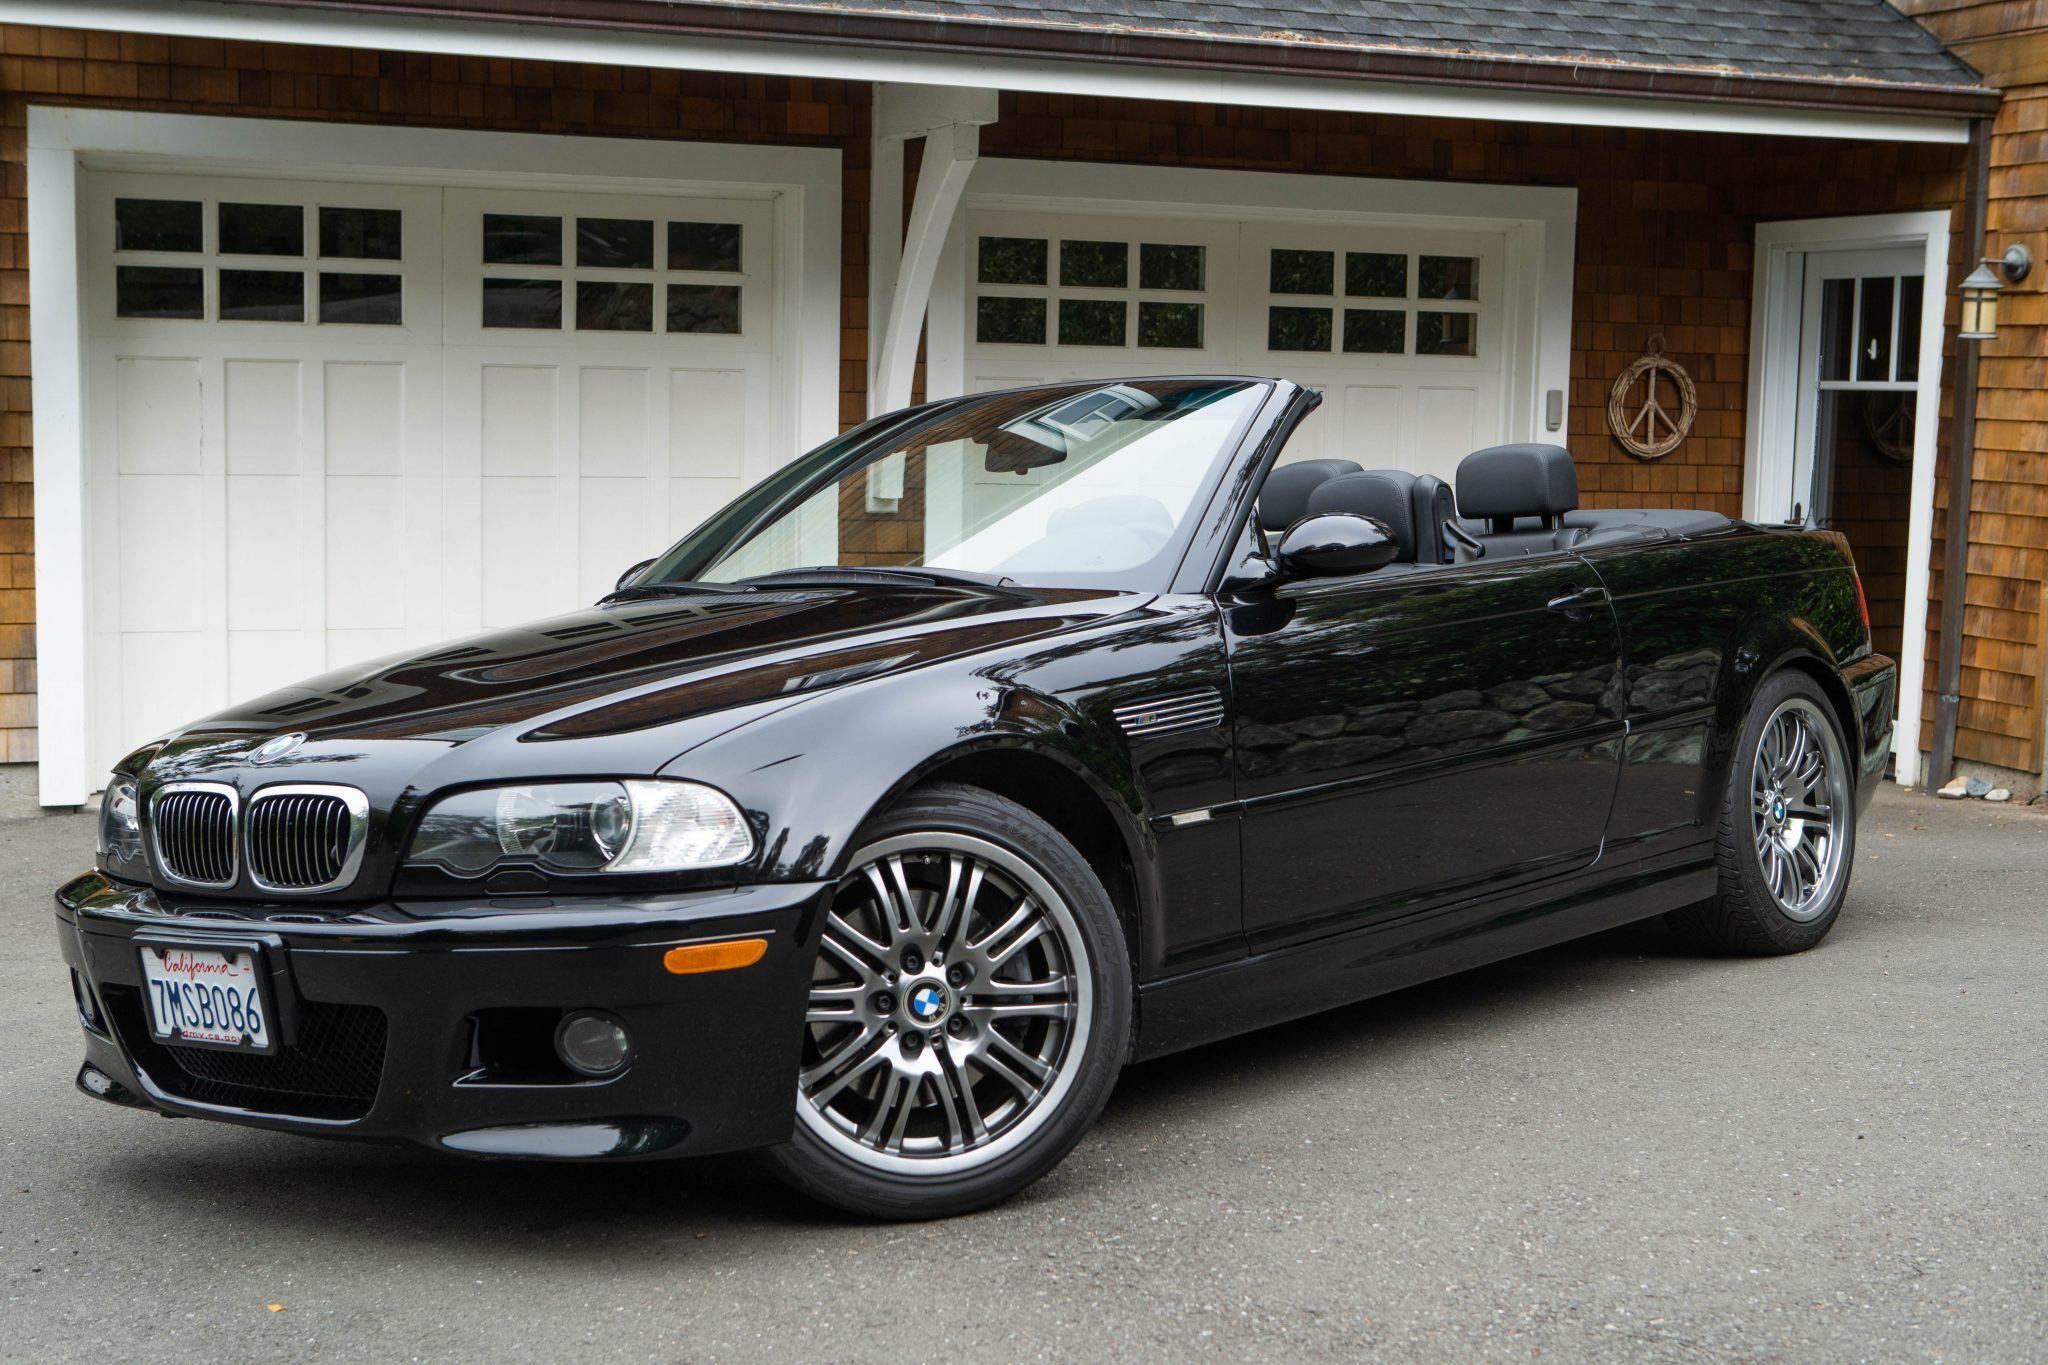 2005 Bmw M3 Convertible 6 Speed Vin Wbsbr93435pk08771 Classic Com